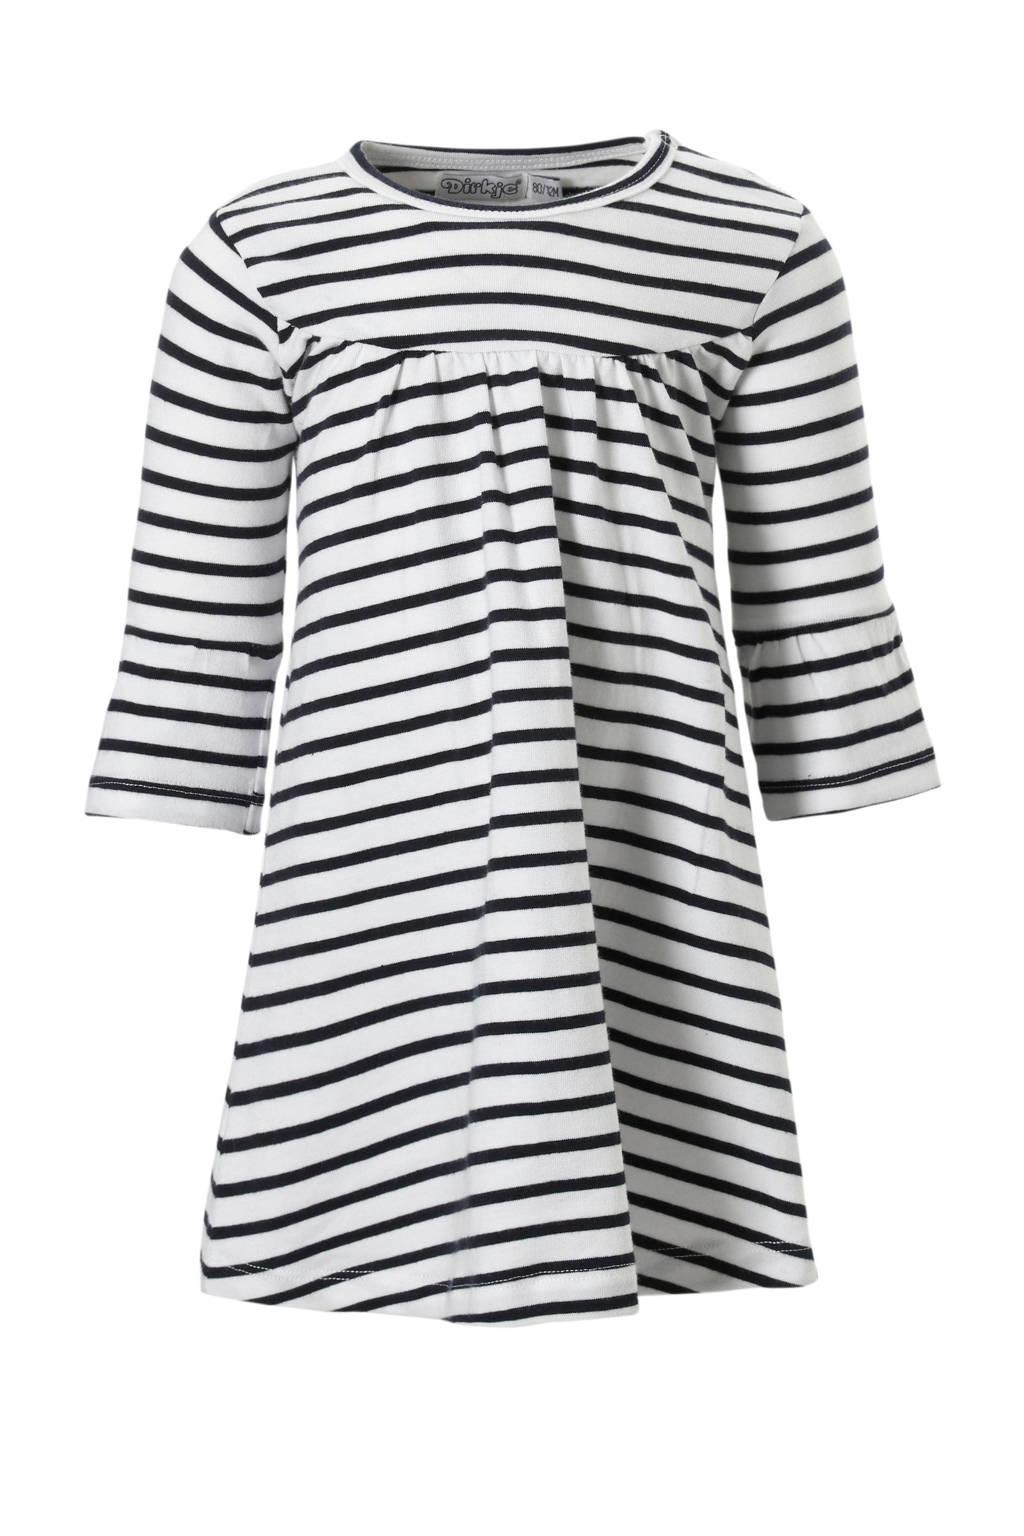 Dirkje jurk met strepen, Wit/ marine